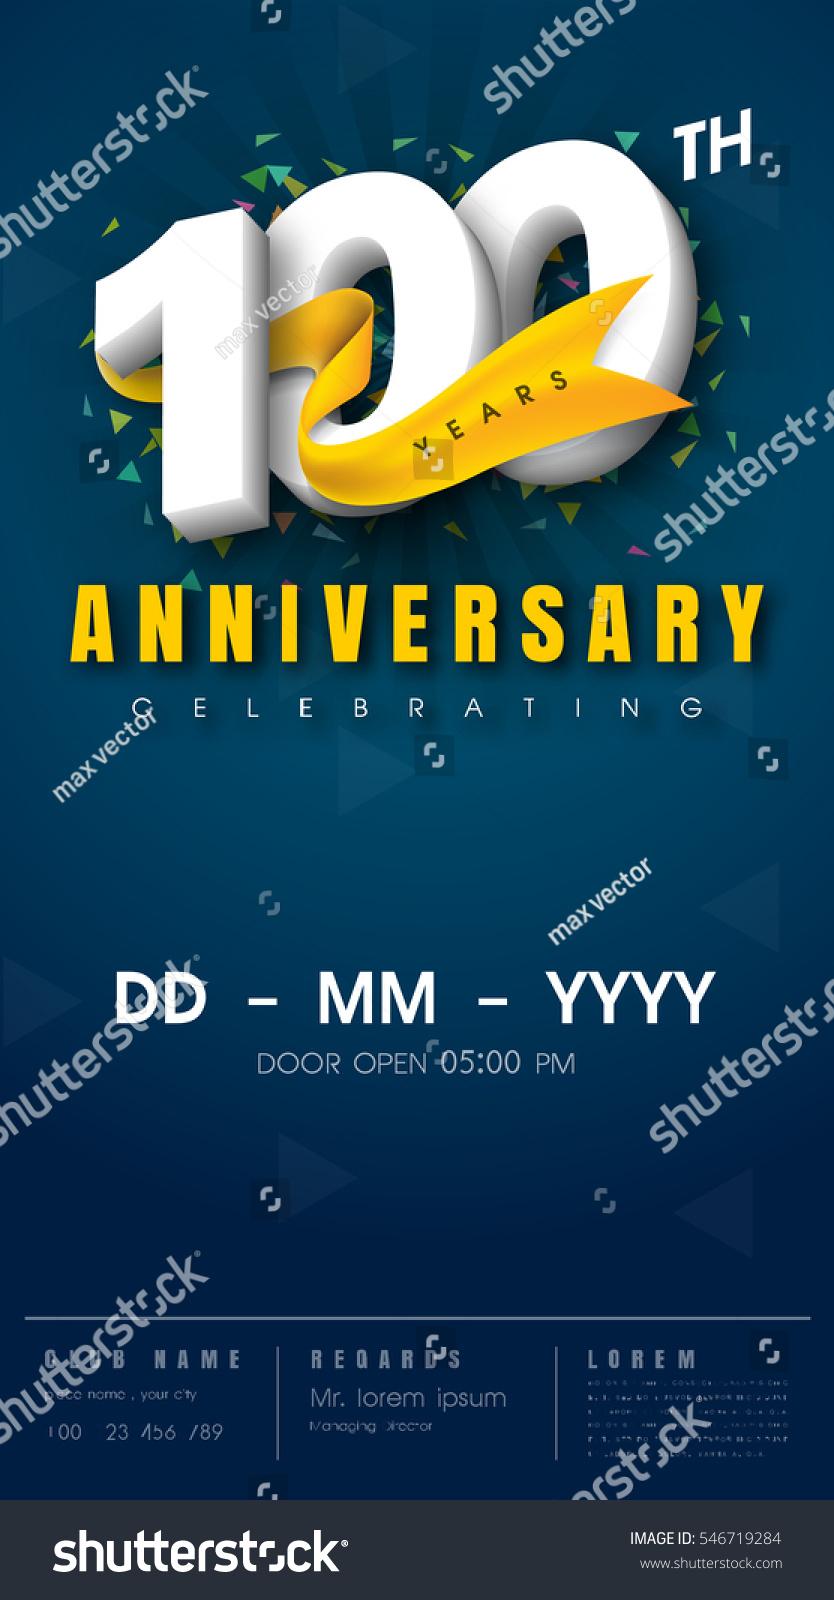 100 Years Anniversary Invitation Card Celebration Stock Vector (Royalty  Free) 546719284